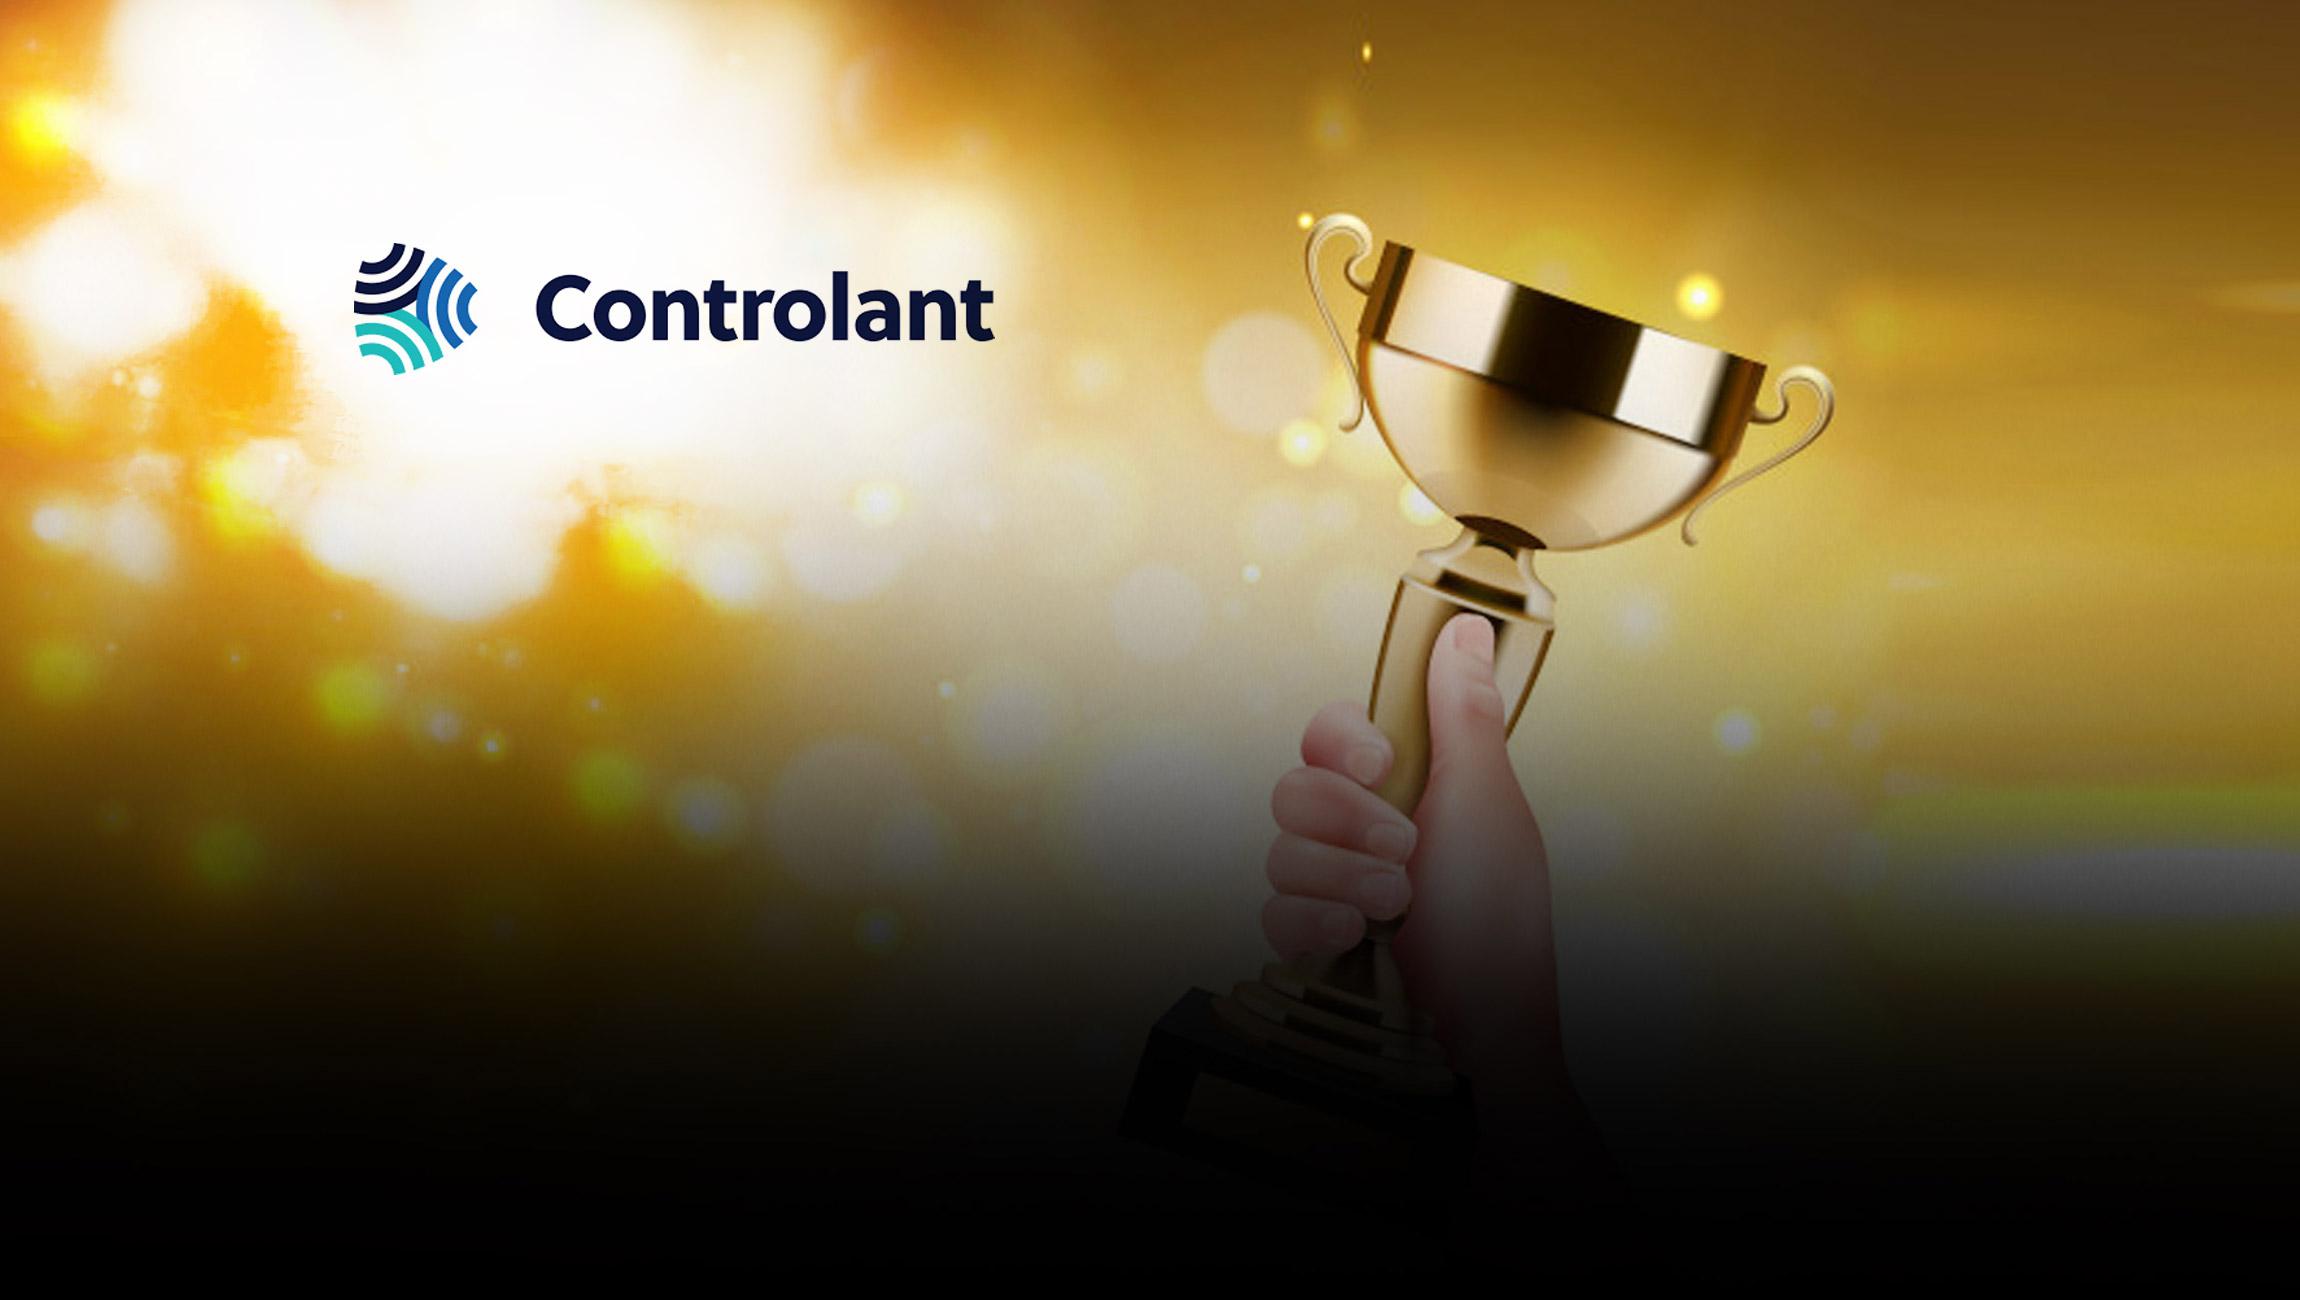 Controlant CQO Anna Karlsdottir Named a Winner of the Supply & Demand Chain Executive Women in Supply Chain Award